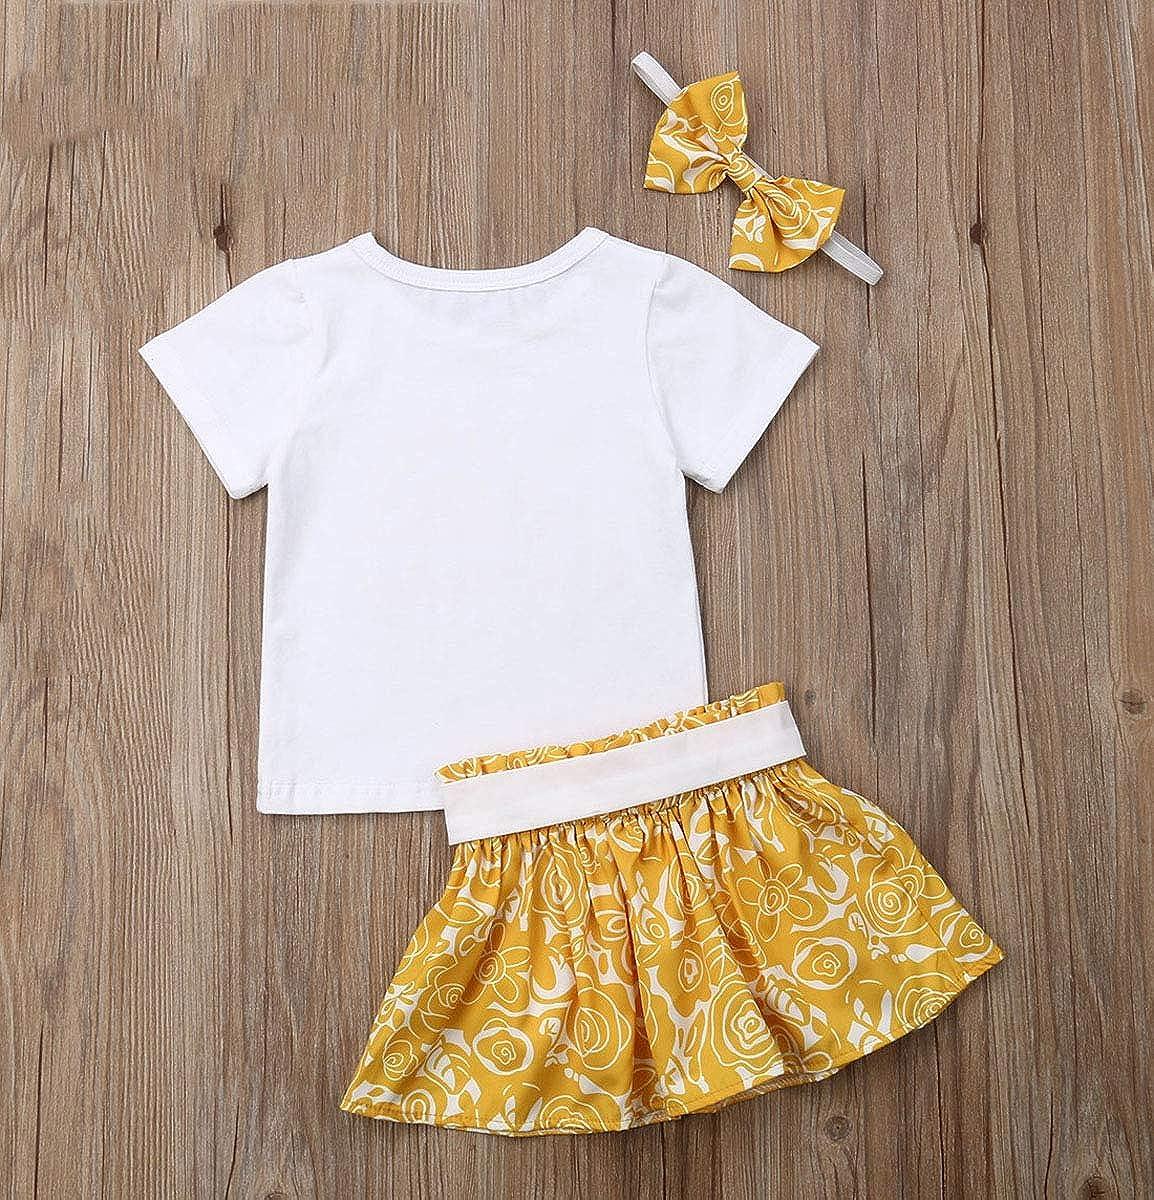 Summer Girls Skirt Set Headband Short Sleeve Letter Print Tops Bowknot Tutu Skirt 3pcs